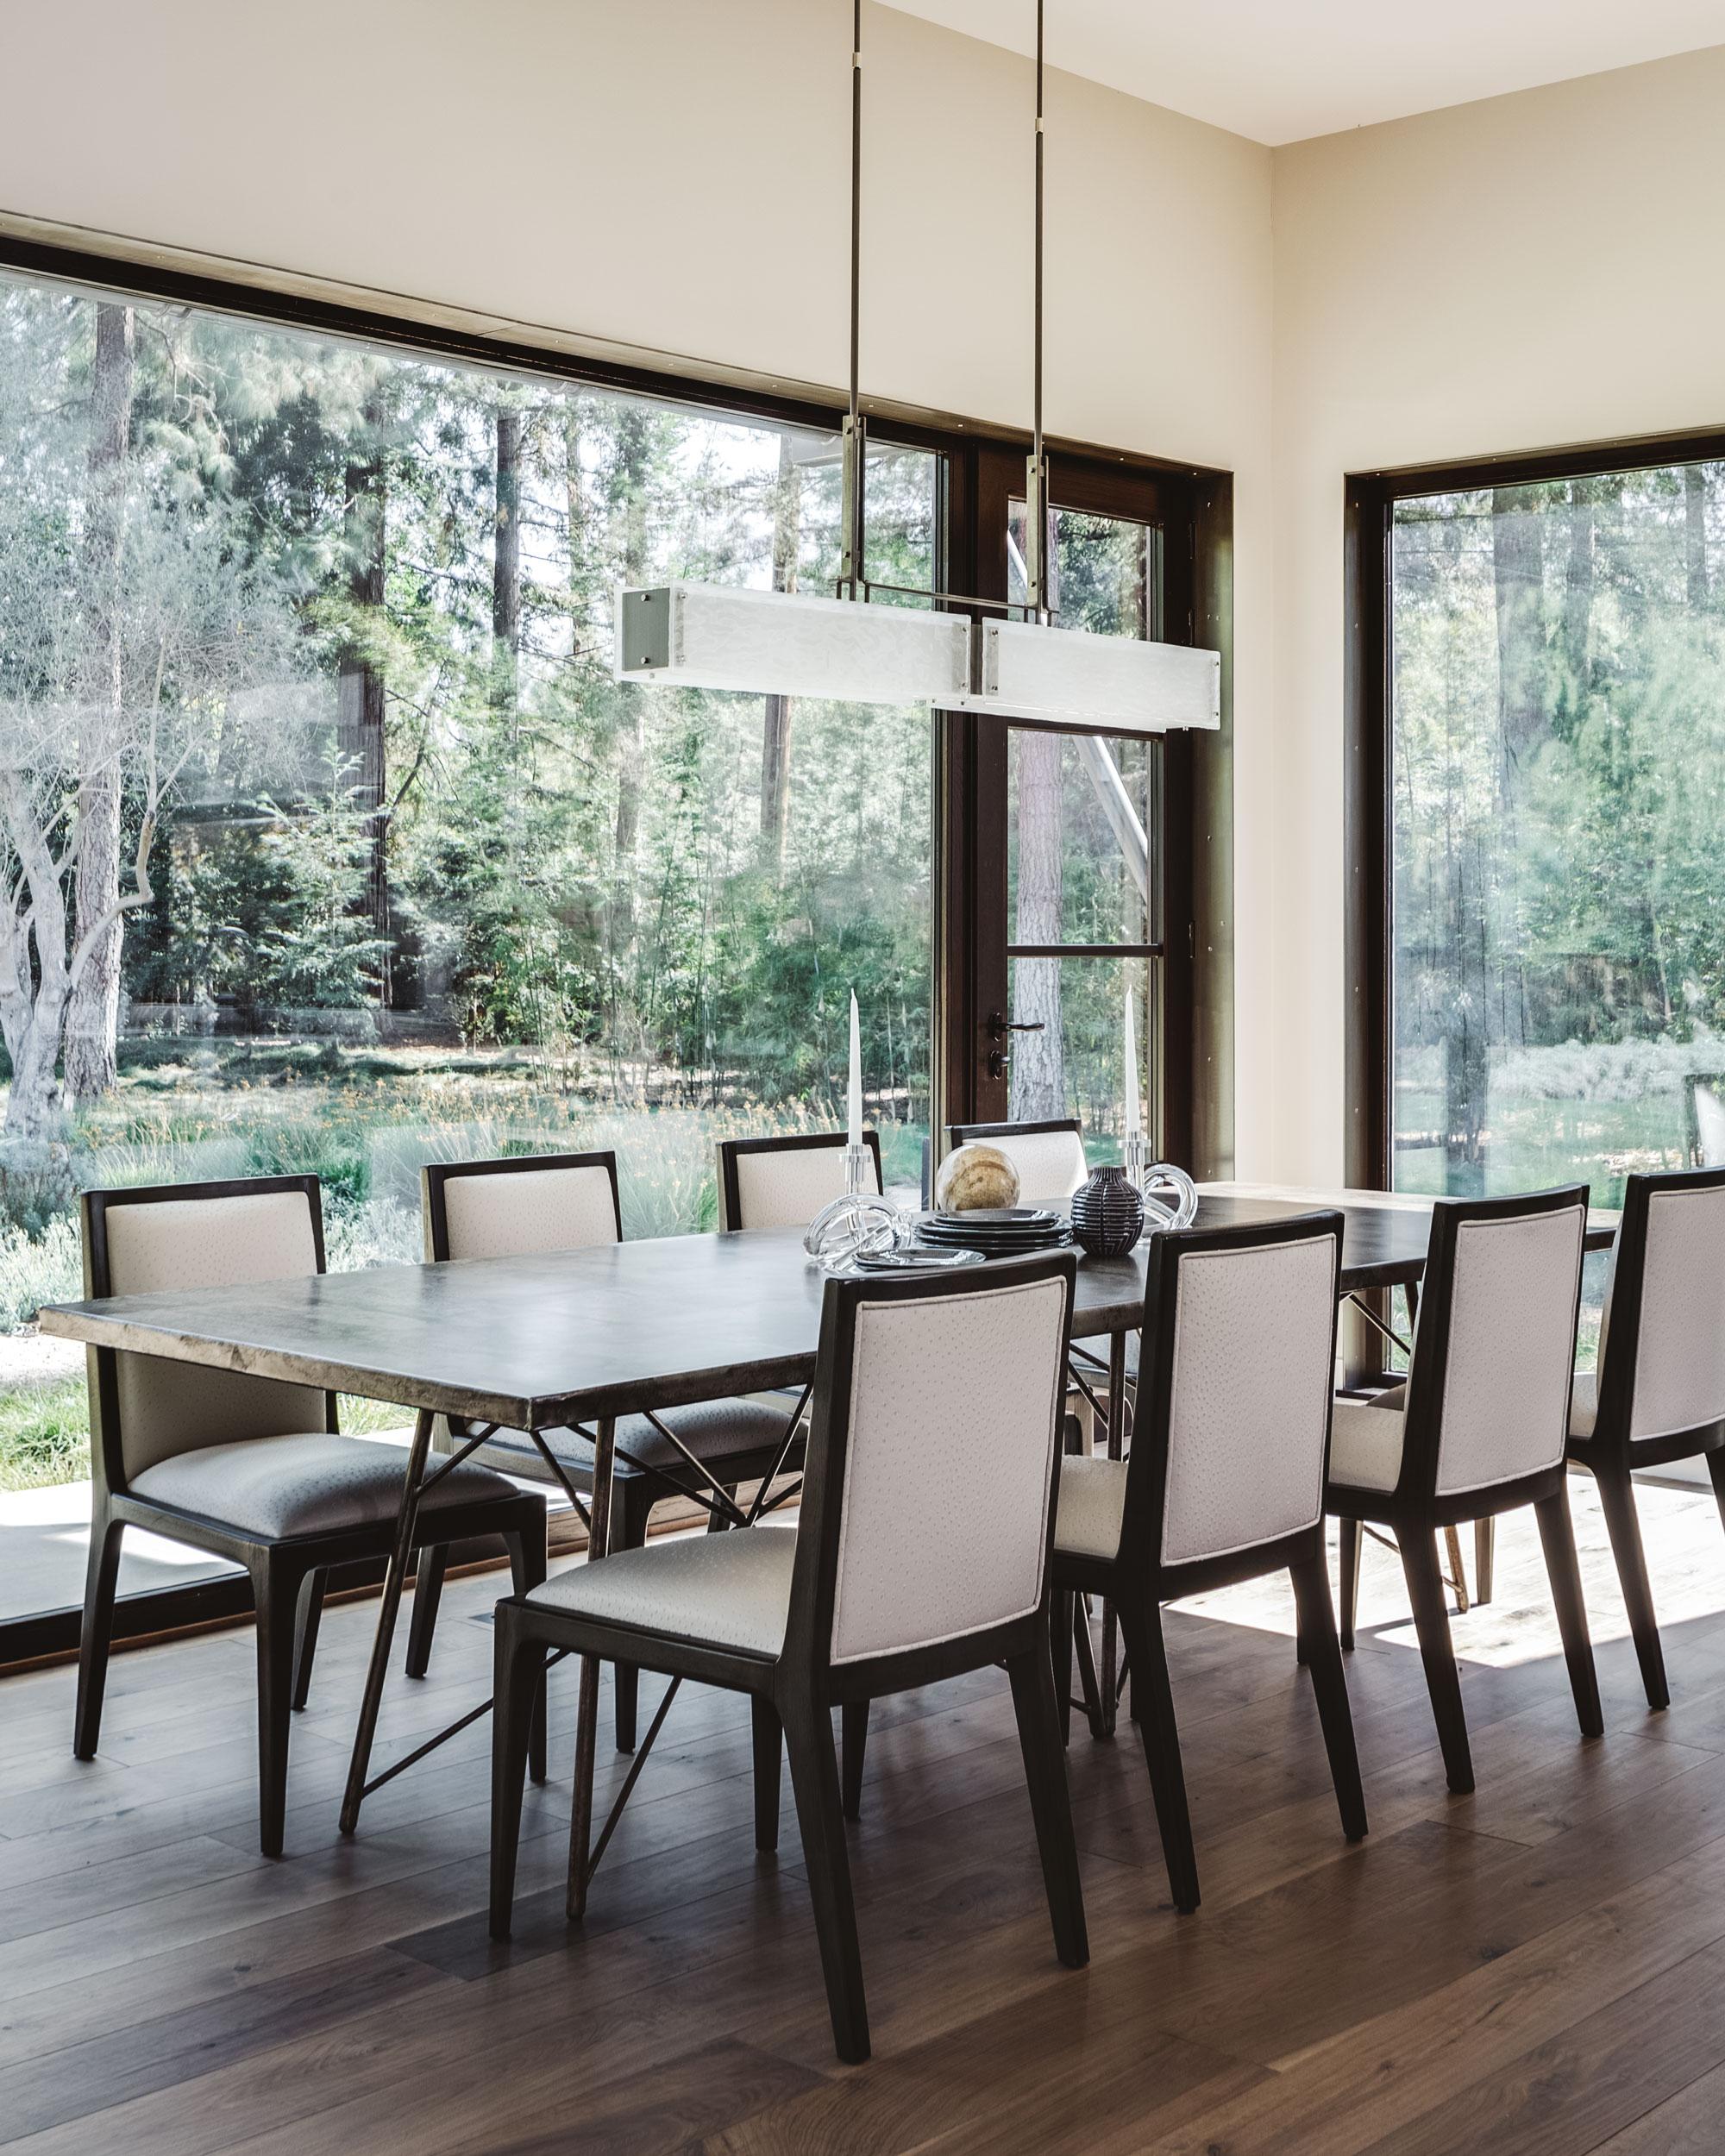 A Hammerton Studio Urban Loft Trestle linear dining light featuring hand-textured kiln-fired glass. By Nash Design Group   San Mateo, CA